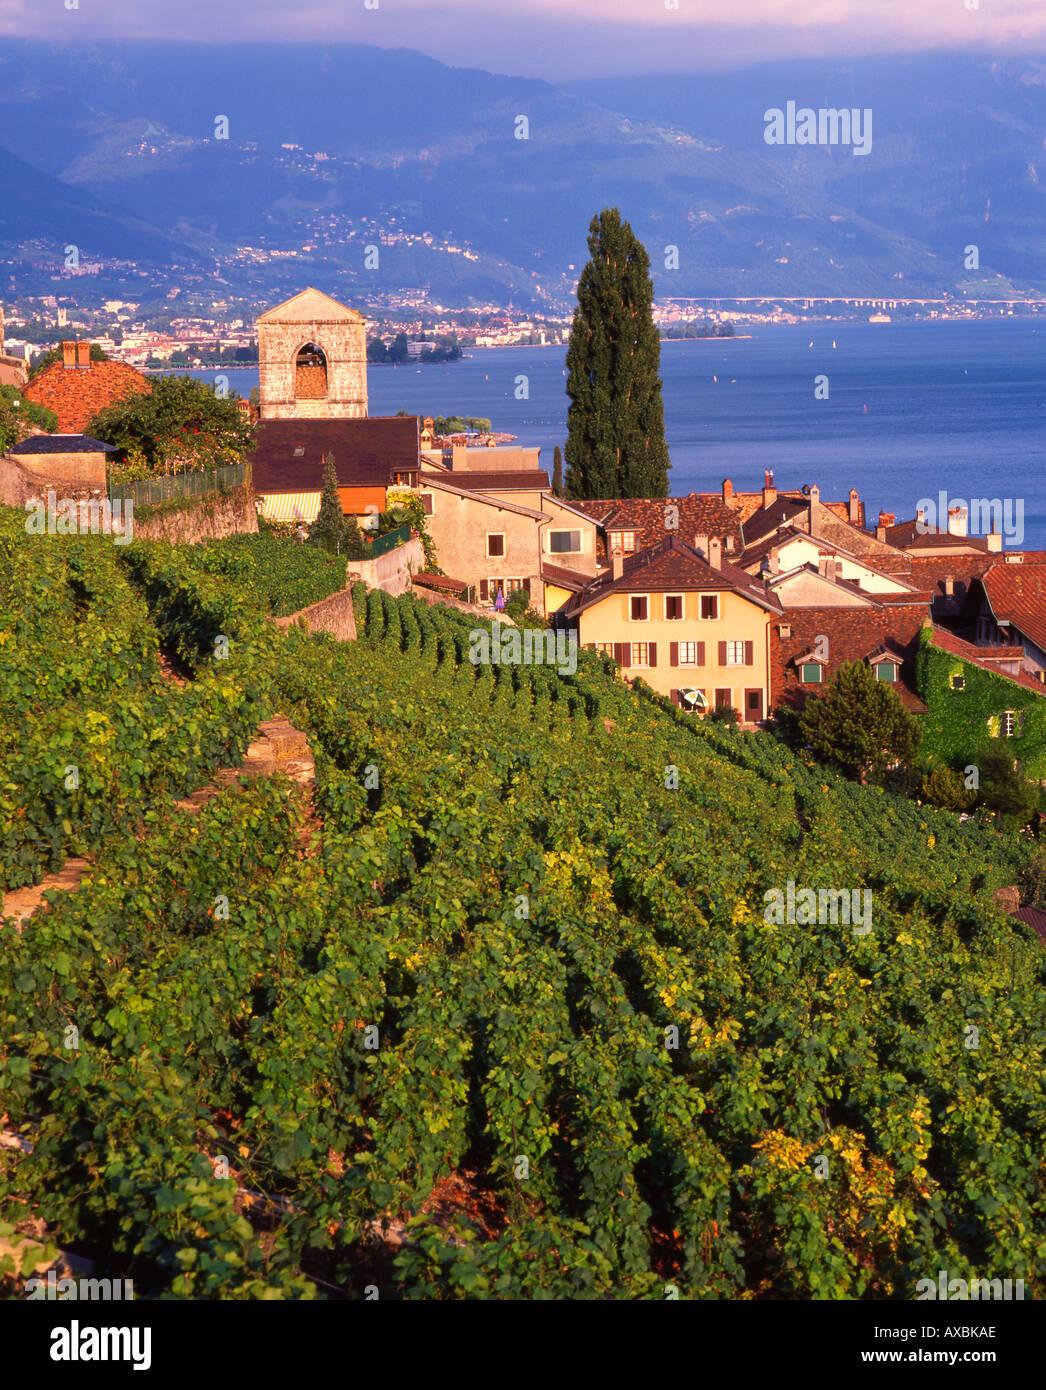 Switzerland Lac Leman St Saphorin terraced vineyard Stock Photo